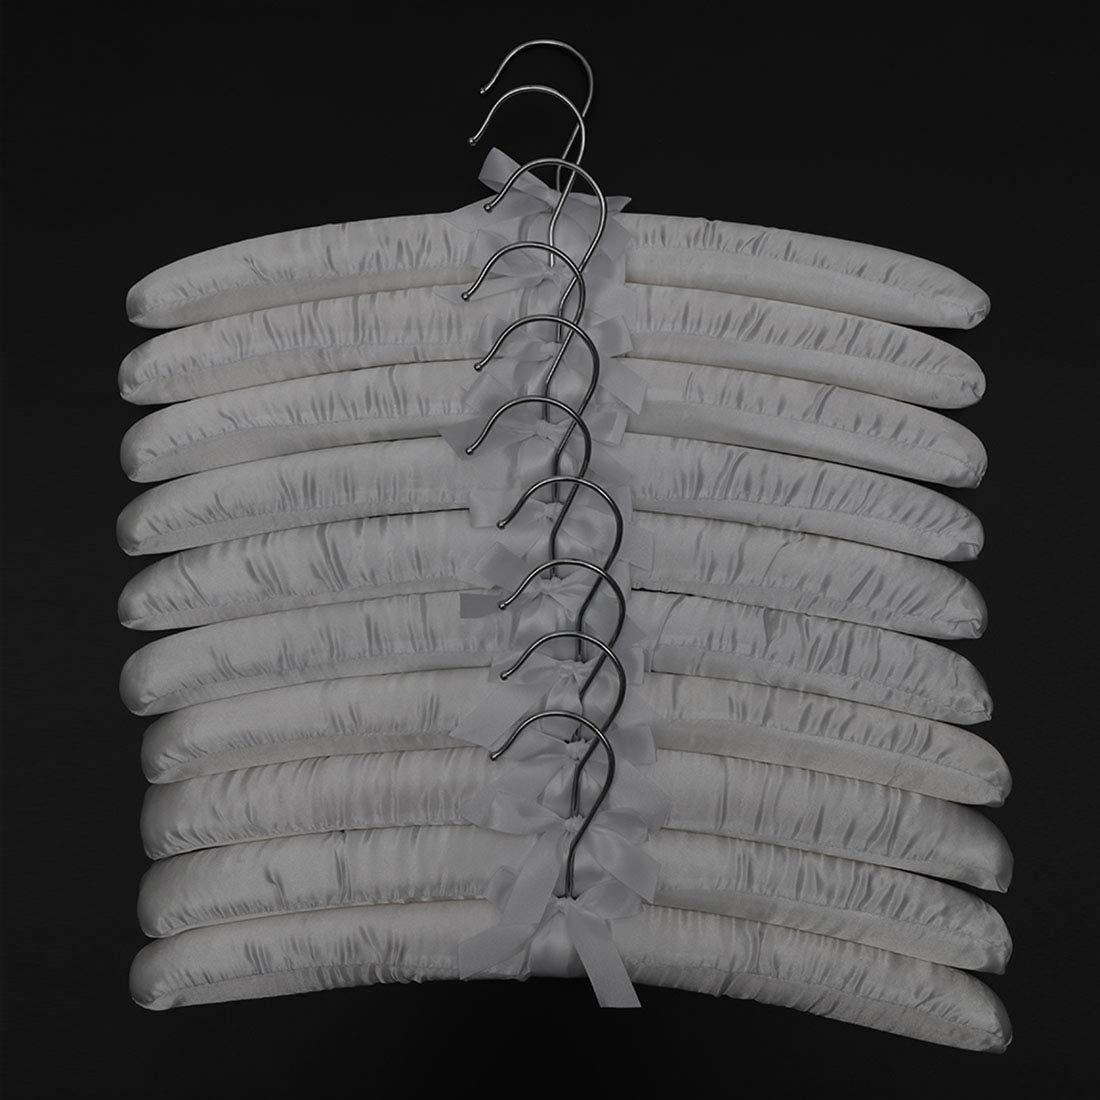 PetHot 10 Pcs Clothes Coat Hangers White Satin Padded Soft 43cm Wardrobe Hook For Dresses Wedding Bridal Lingerie Woolen